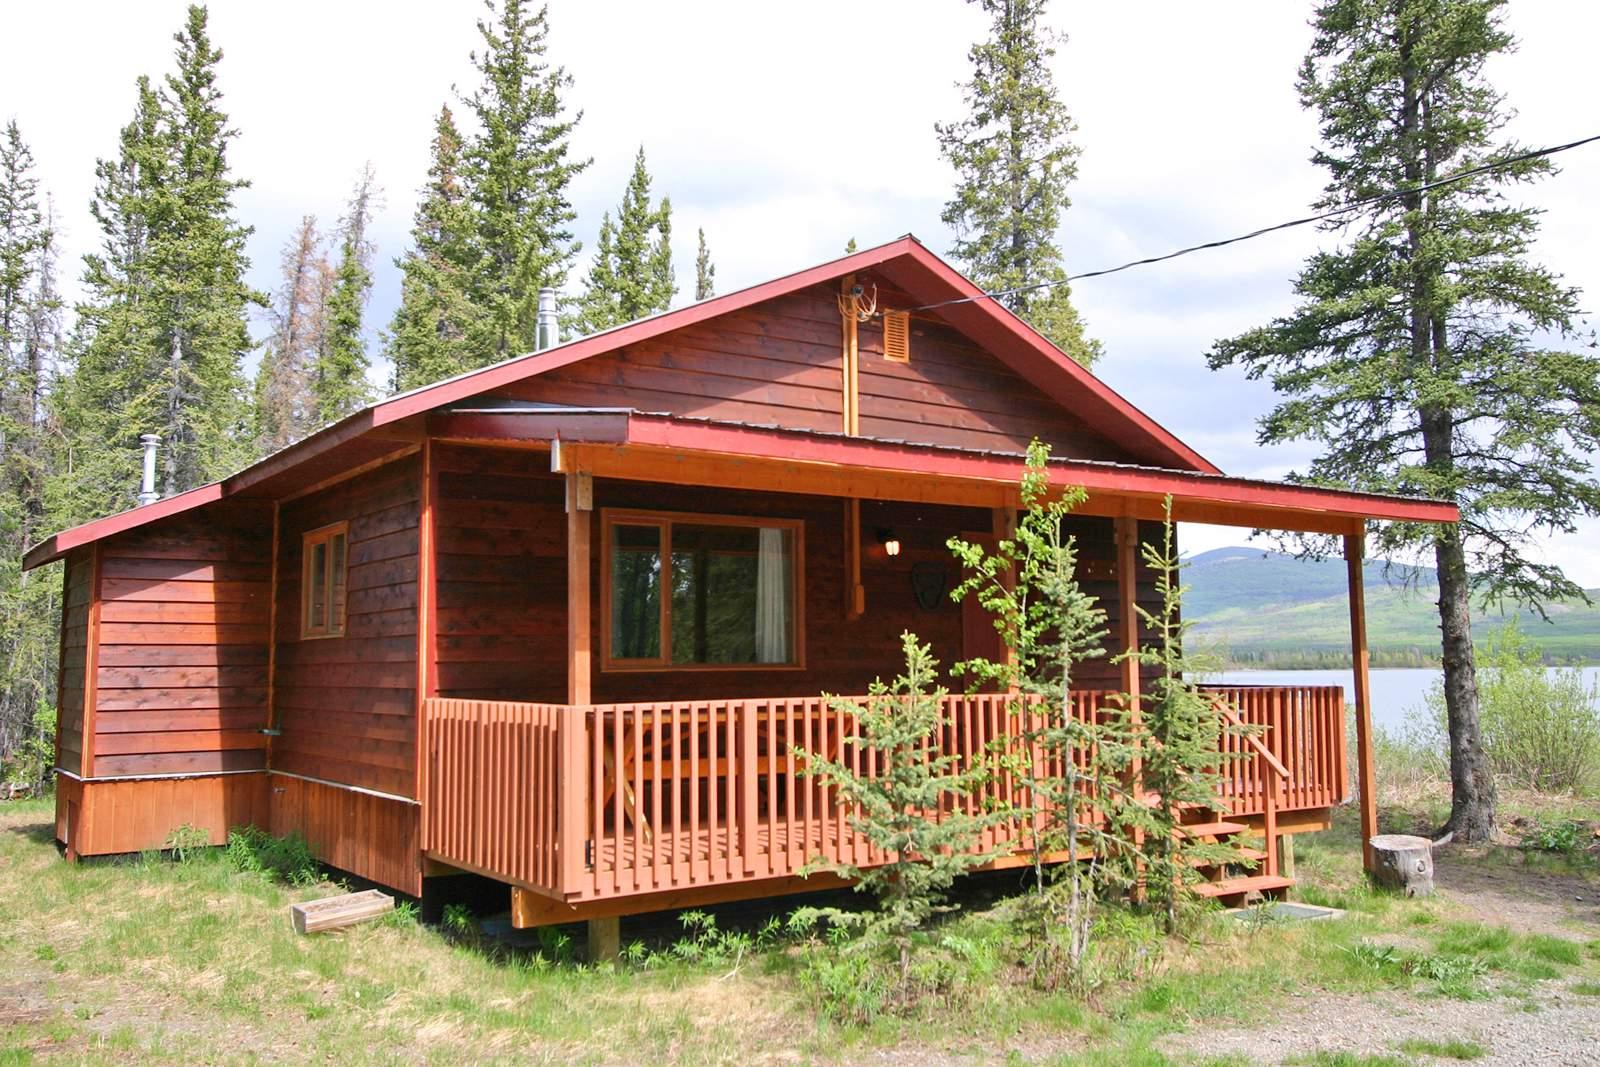 Hotel yukon dalton trail lodge canusa for Trail lodge